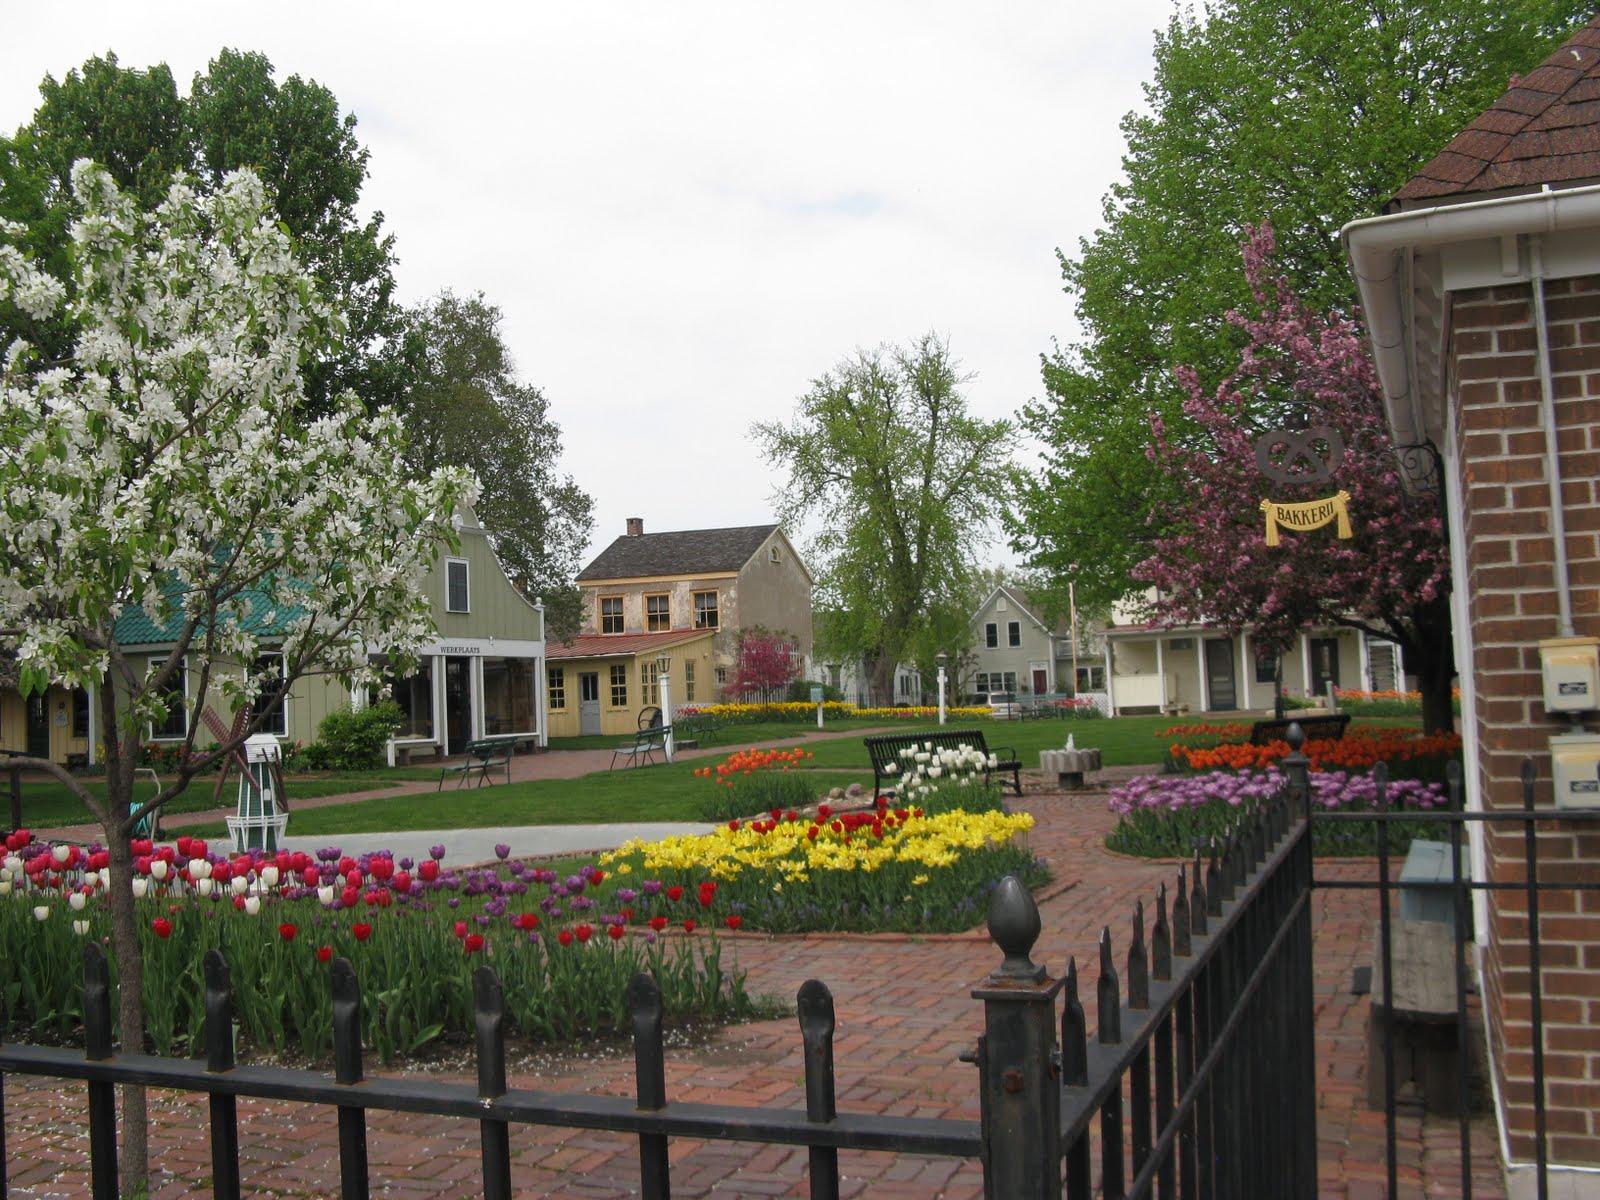 Tarras Travels Tulip Time In Pella Iowa